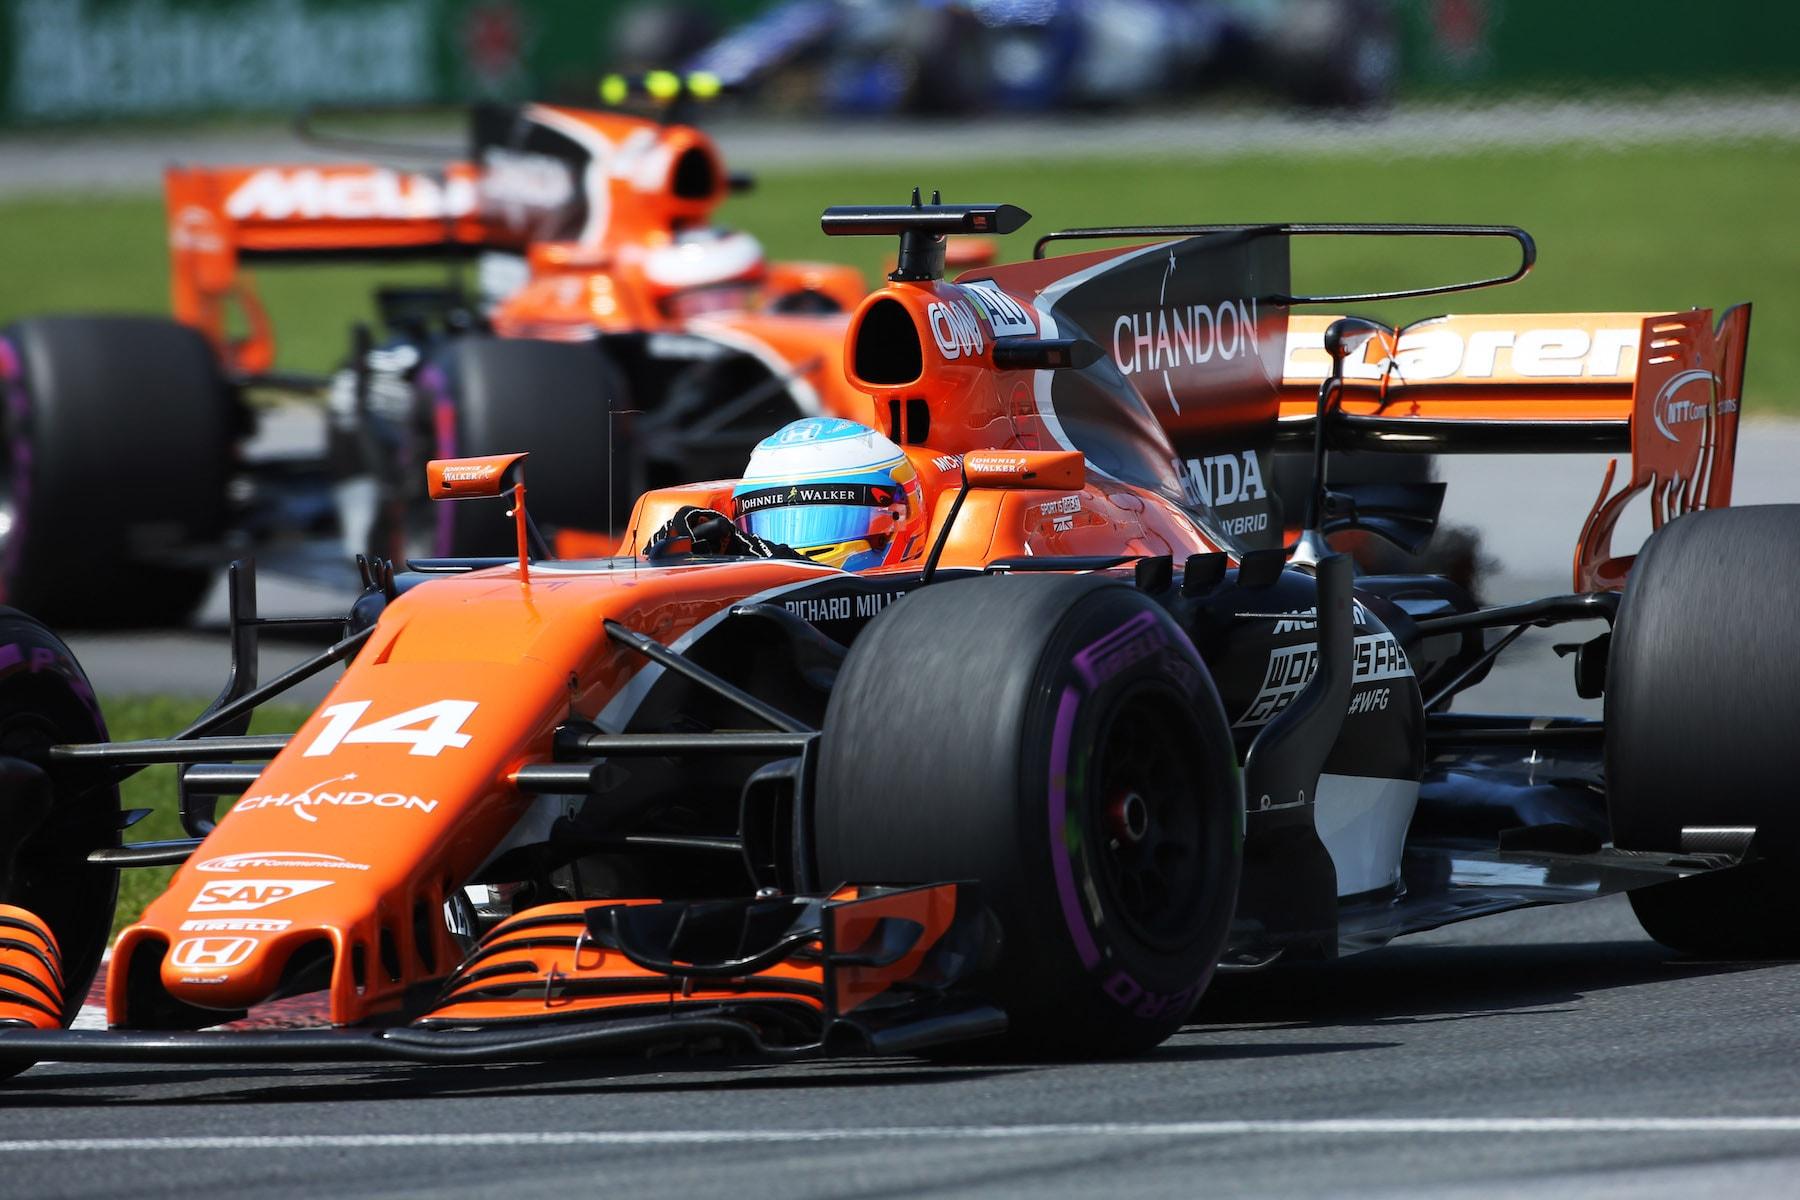 G 2017 Fernando Alonso | McLaren MCL32 | 2017 Canadian GP 2 copy.jpg